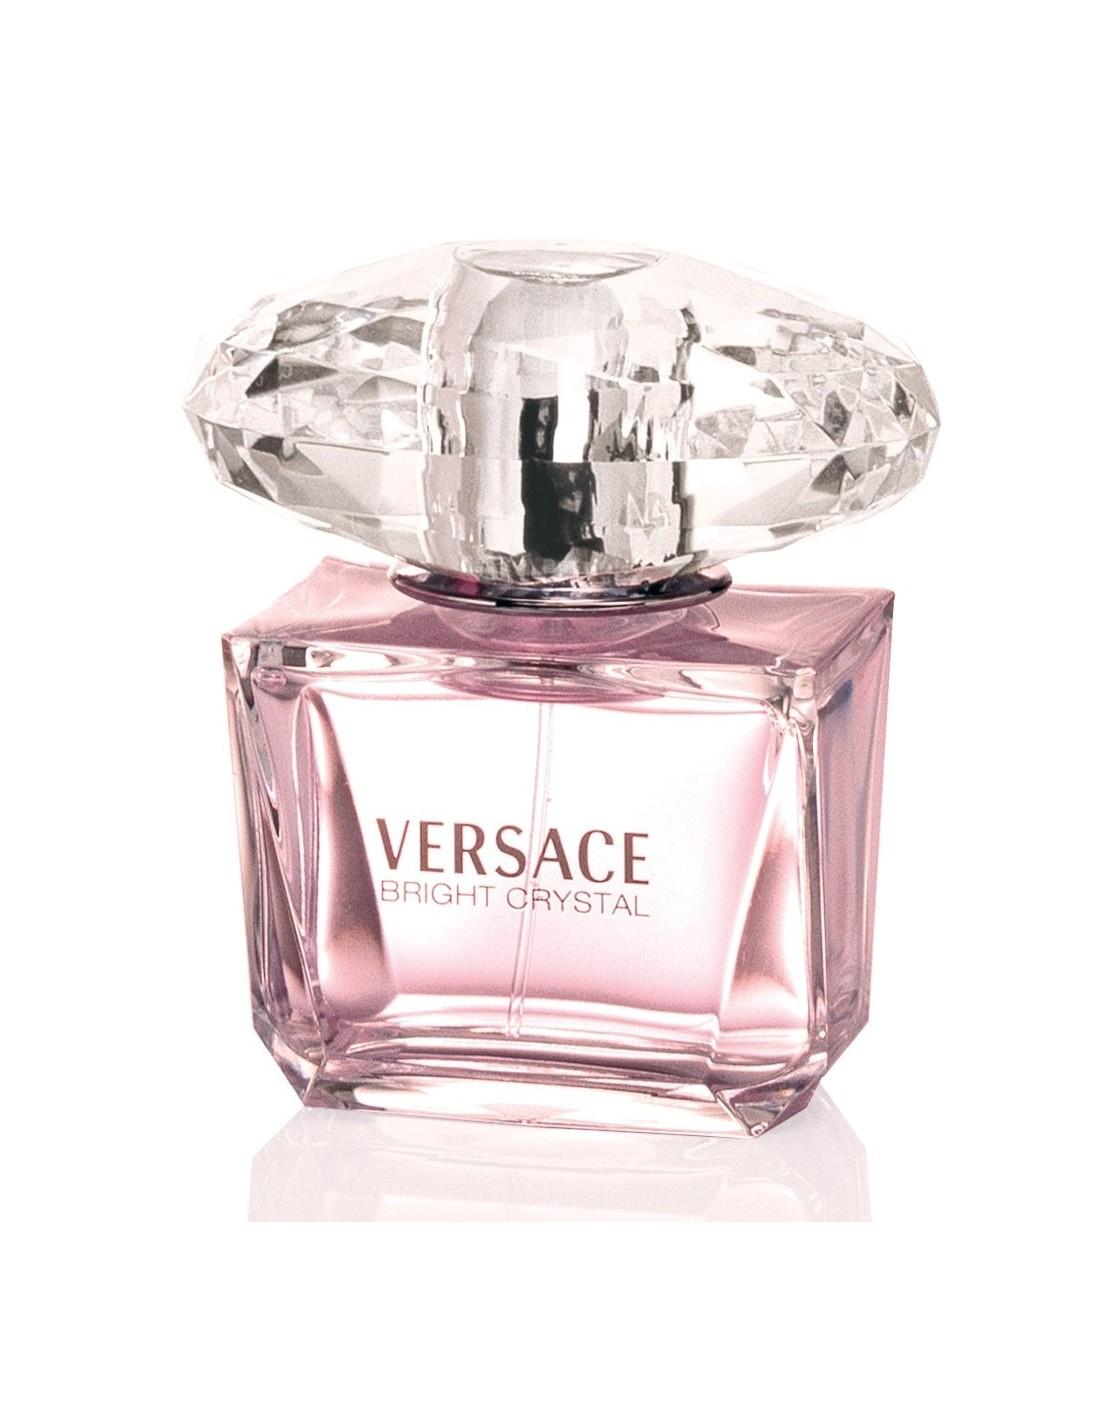 Versace Bright Crystal Eau de Toilette 90 ml Spray TESTER